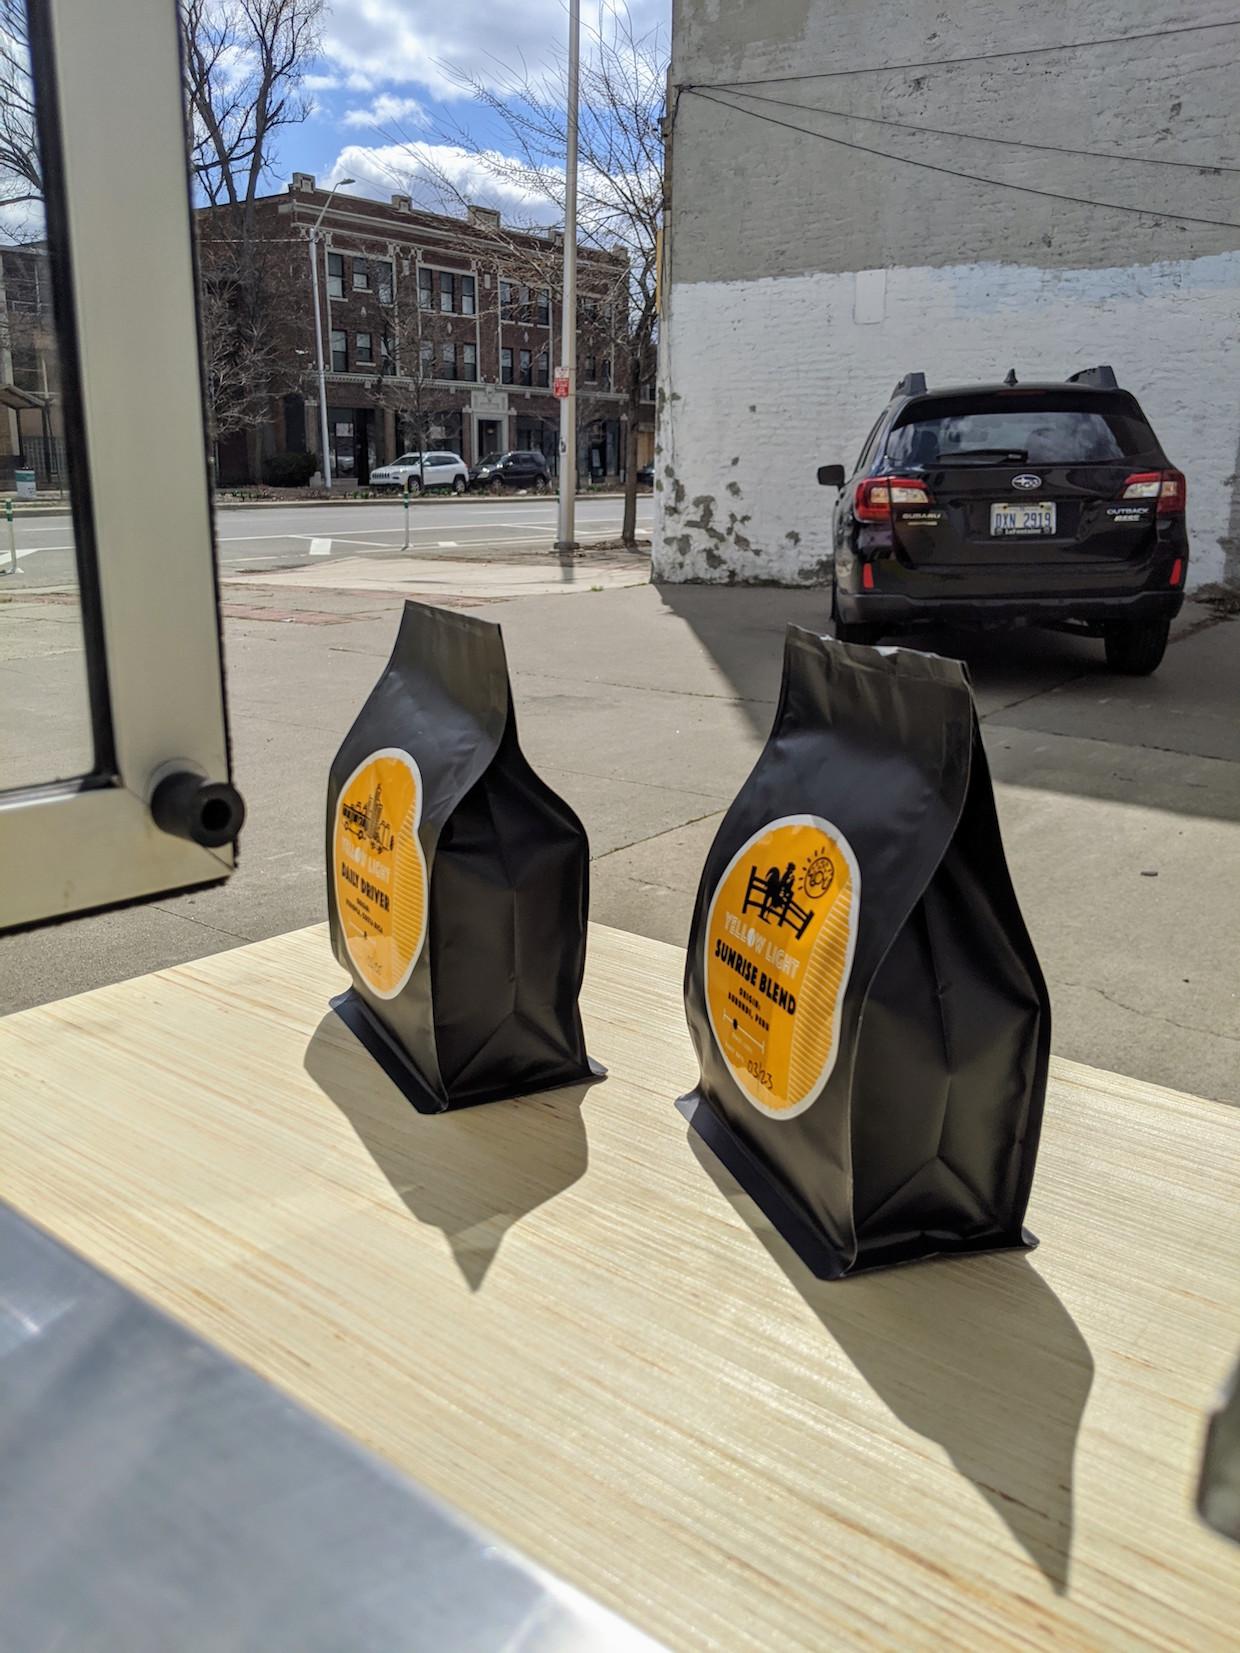 roasted coffee bags